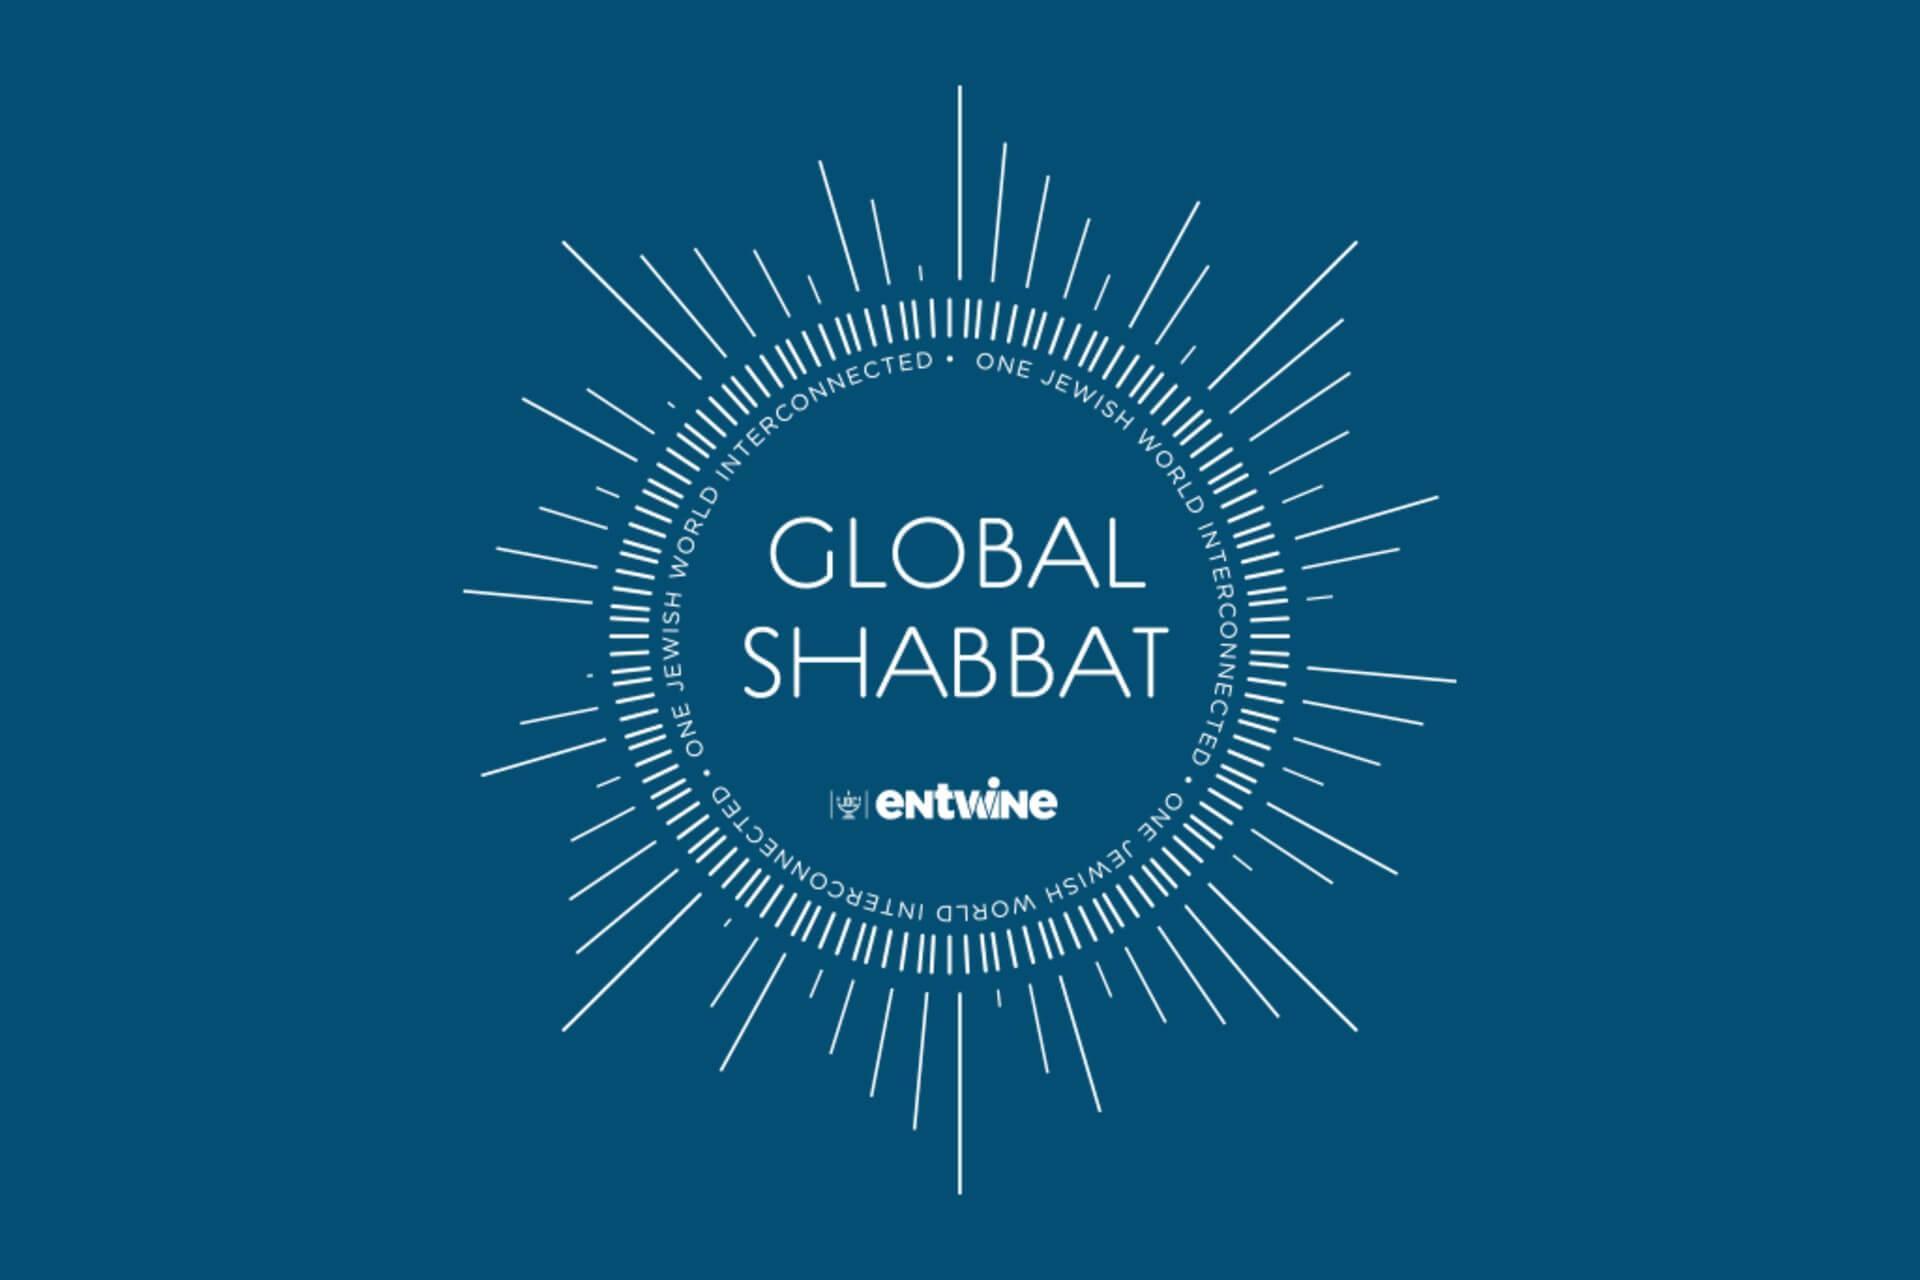 Thumbnail for: Beseder Club приглашает: Global Shabbat Dinner